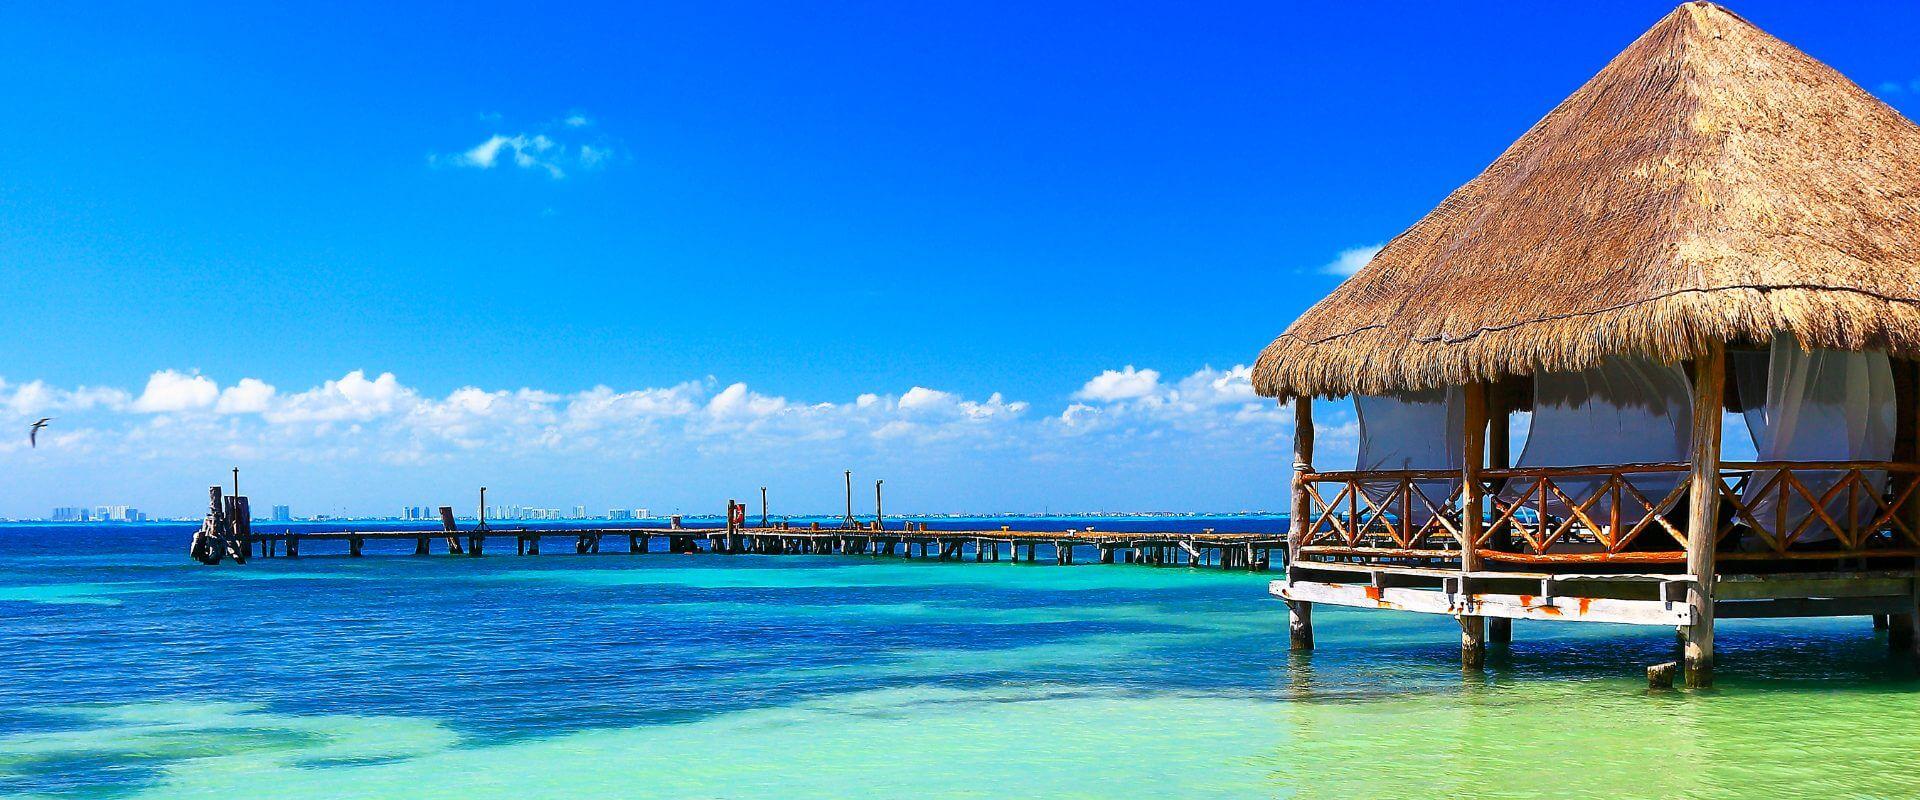 Bild Cancun